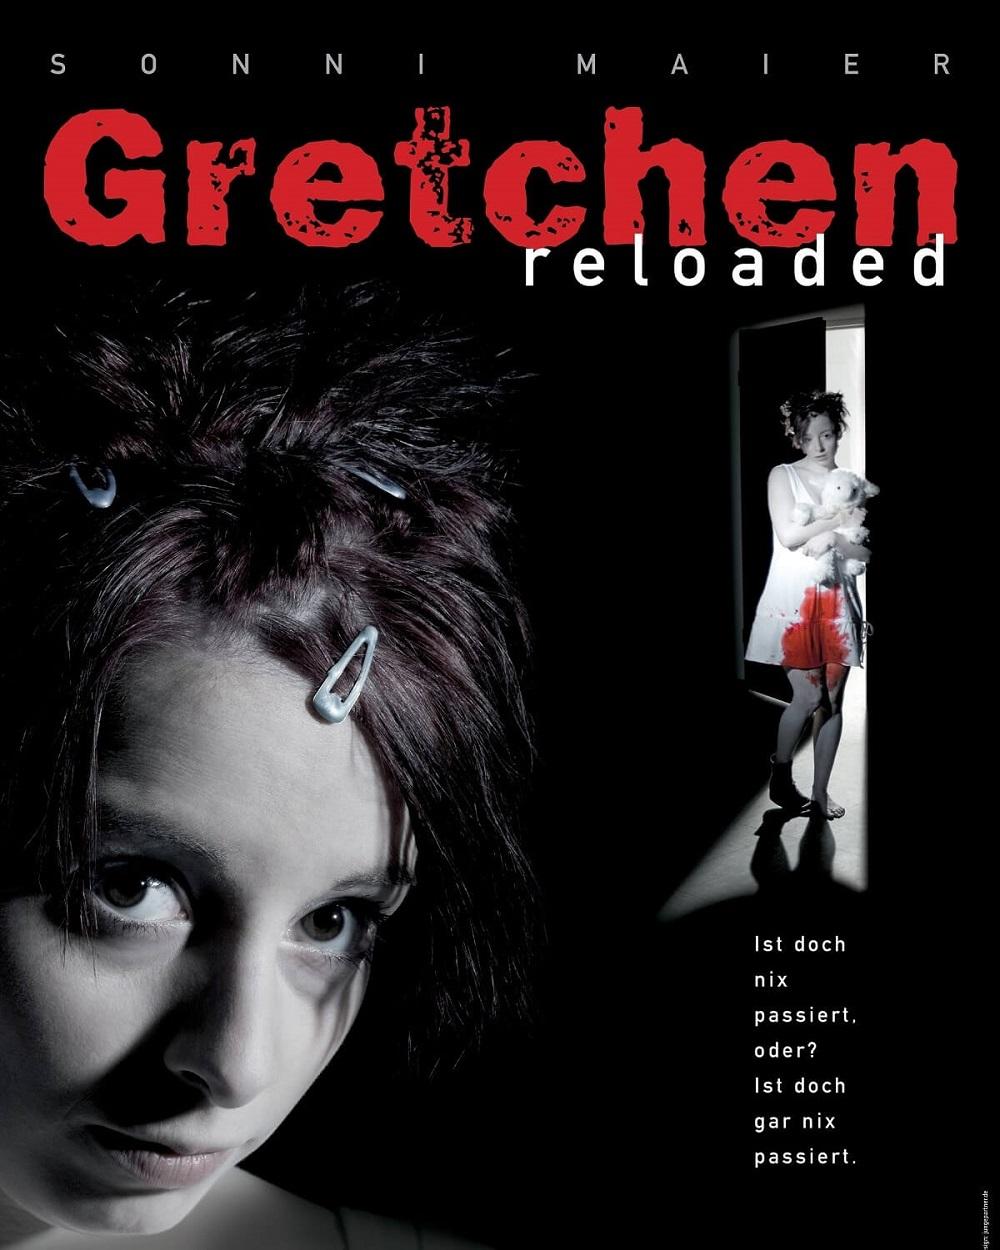 Gretchen reloaded